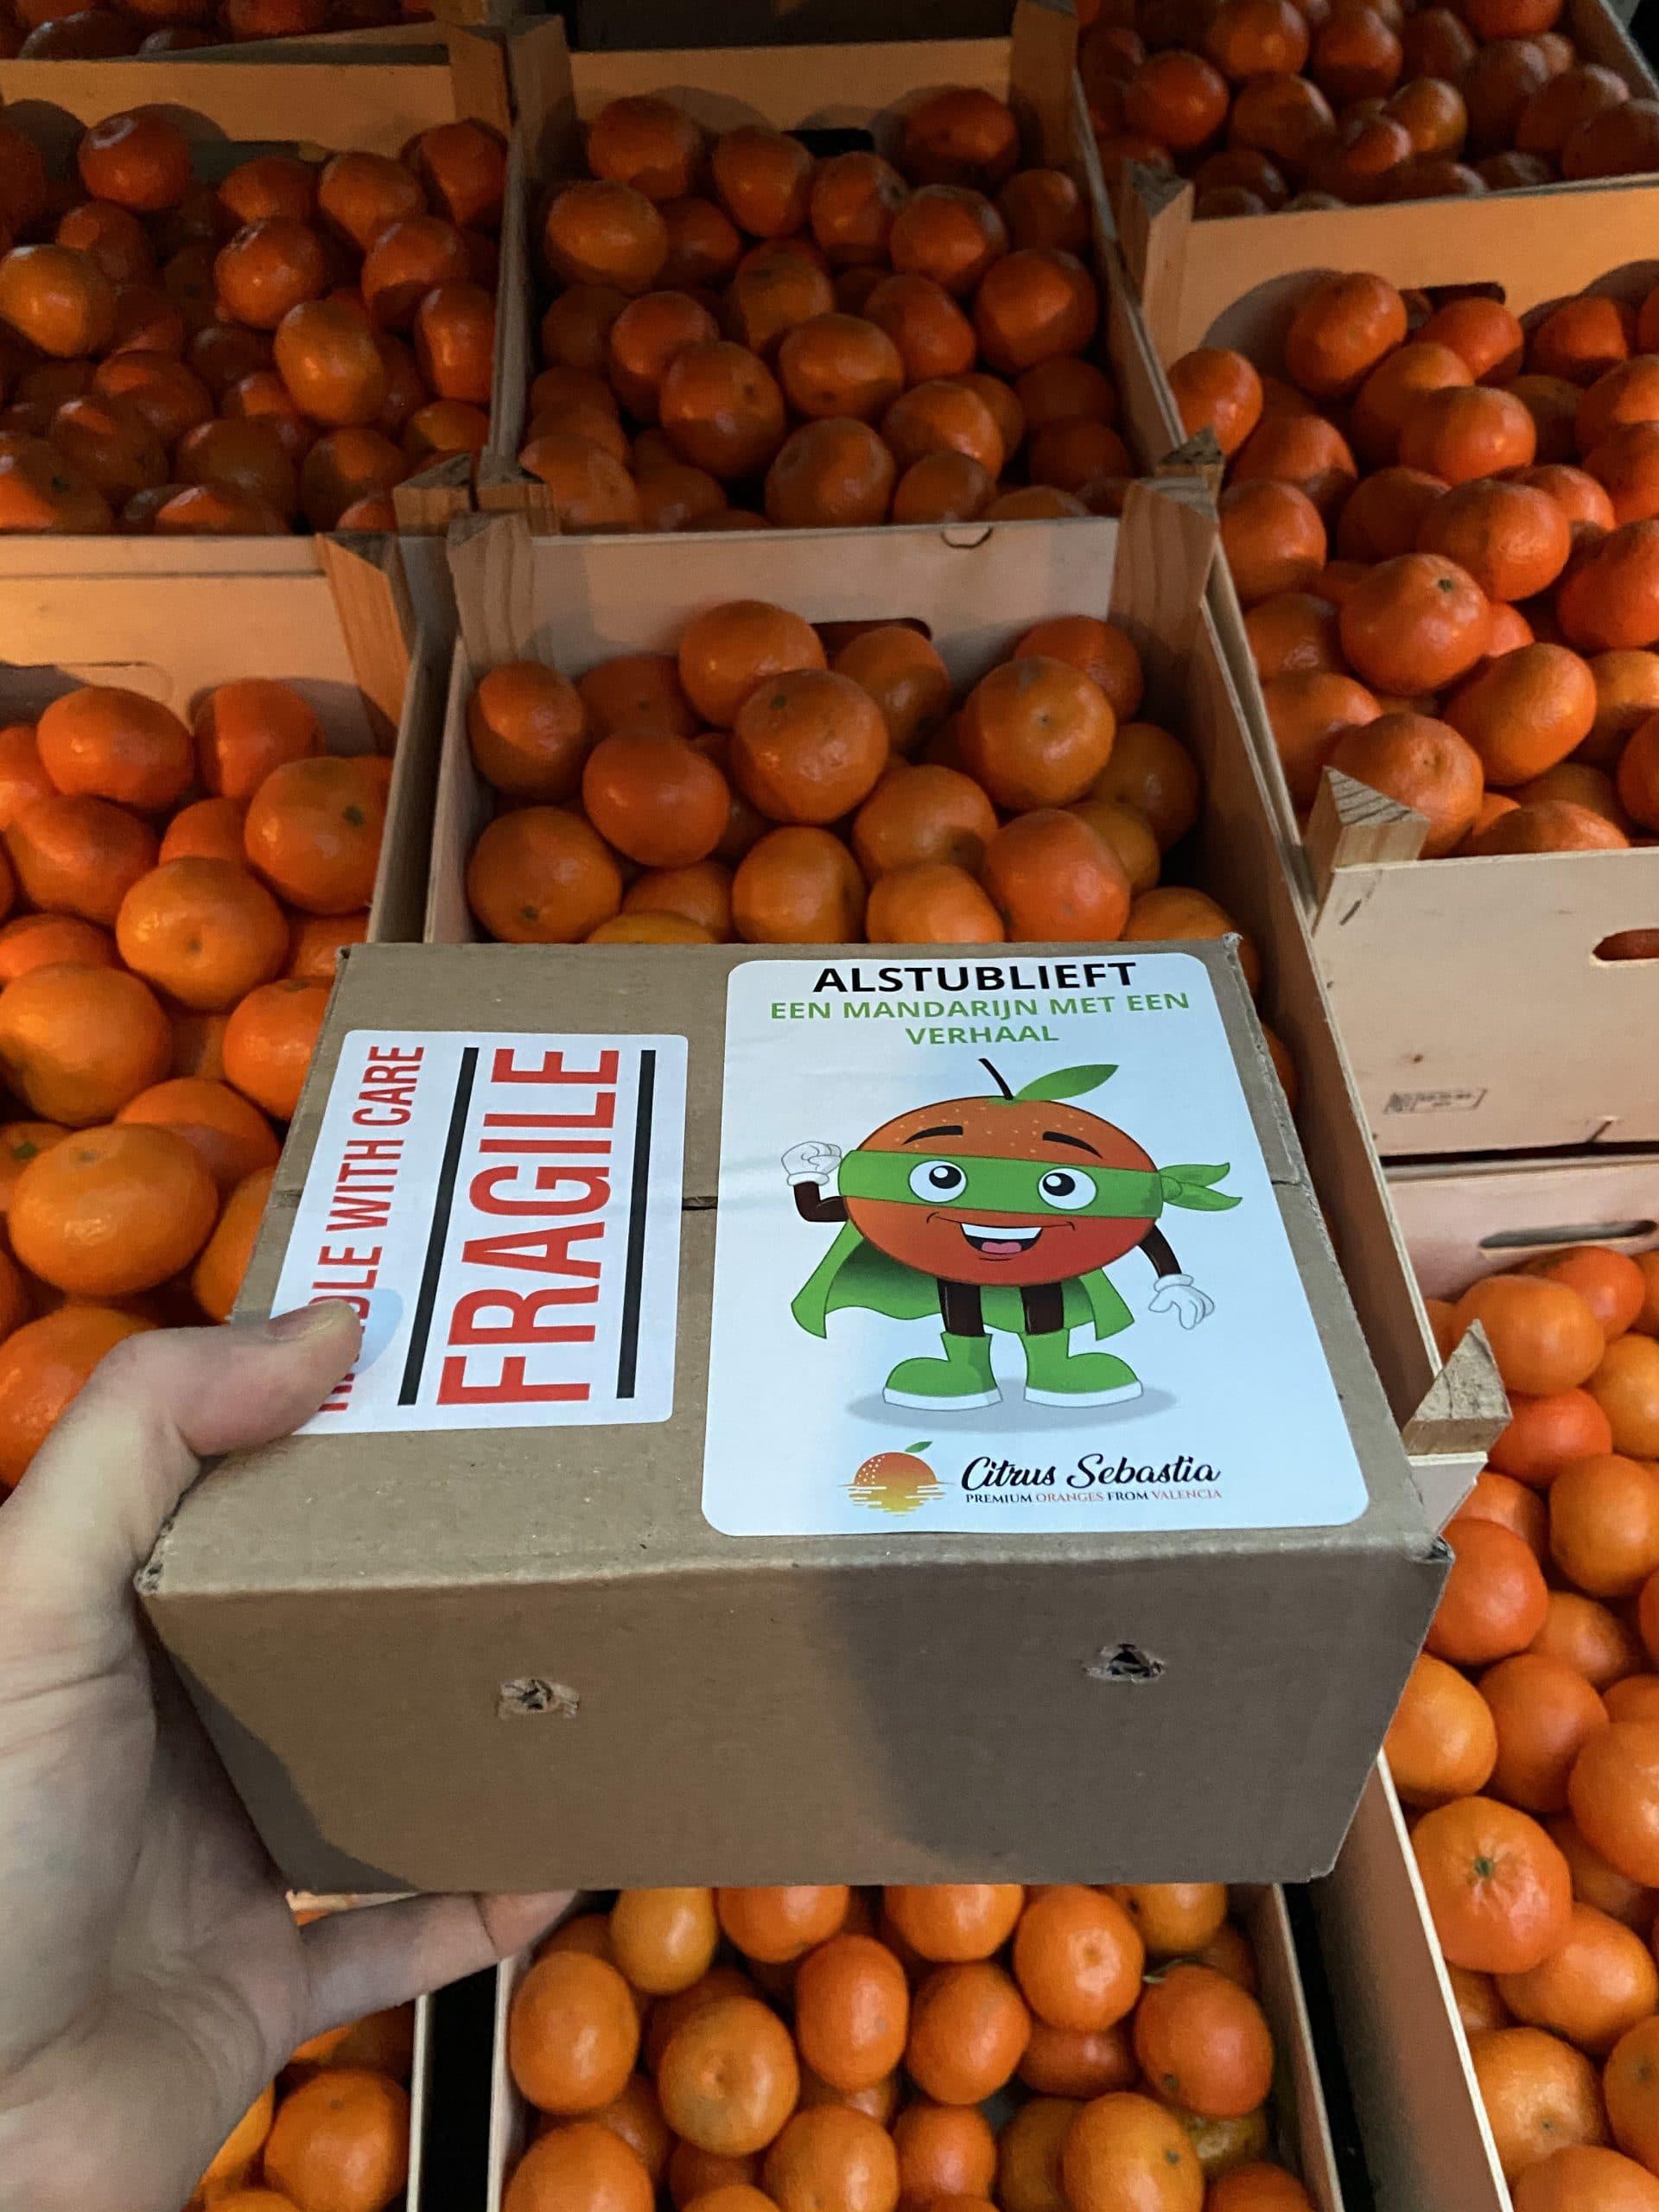 Gratis proefpakket Mandarijnen & Sinaasappels (géén waslaag, géén chemicaliën)